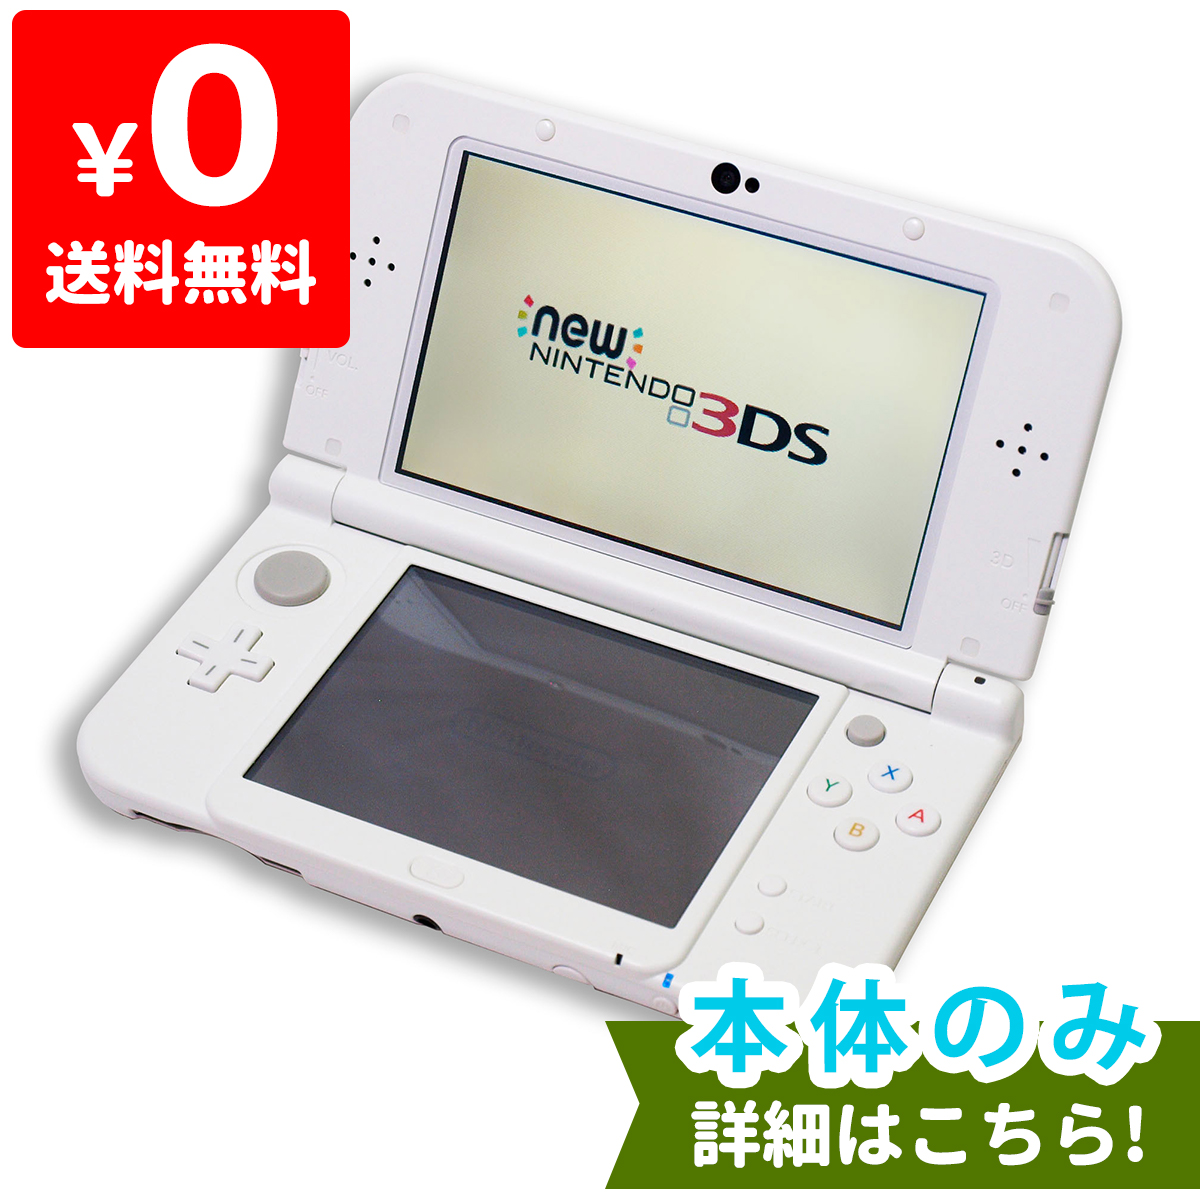 New3DSLL Newニンテンドー3DS LL パールホワイト 本体のみ タッチペン付き Nintendo 任天堂 ニンテンドー 中古 4902370529128 送料無料 【中古】